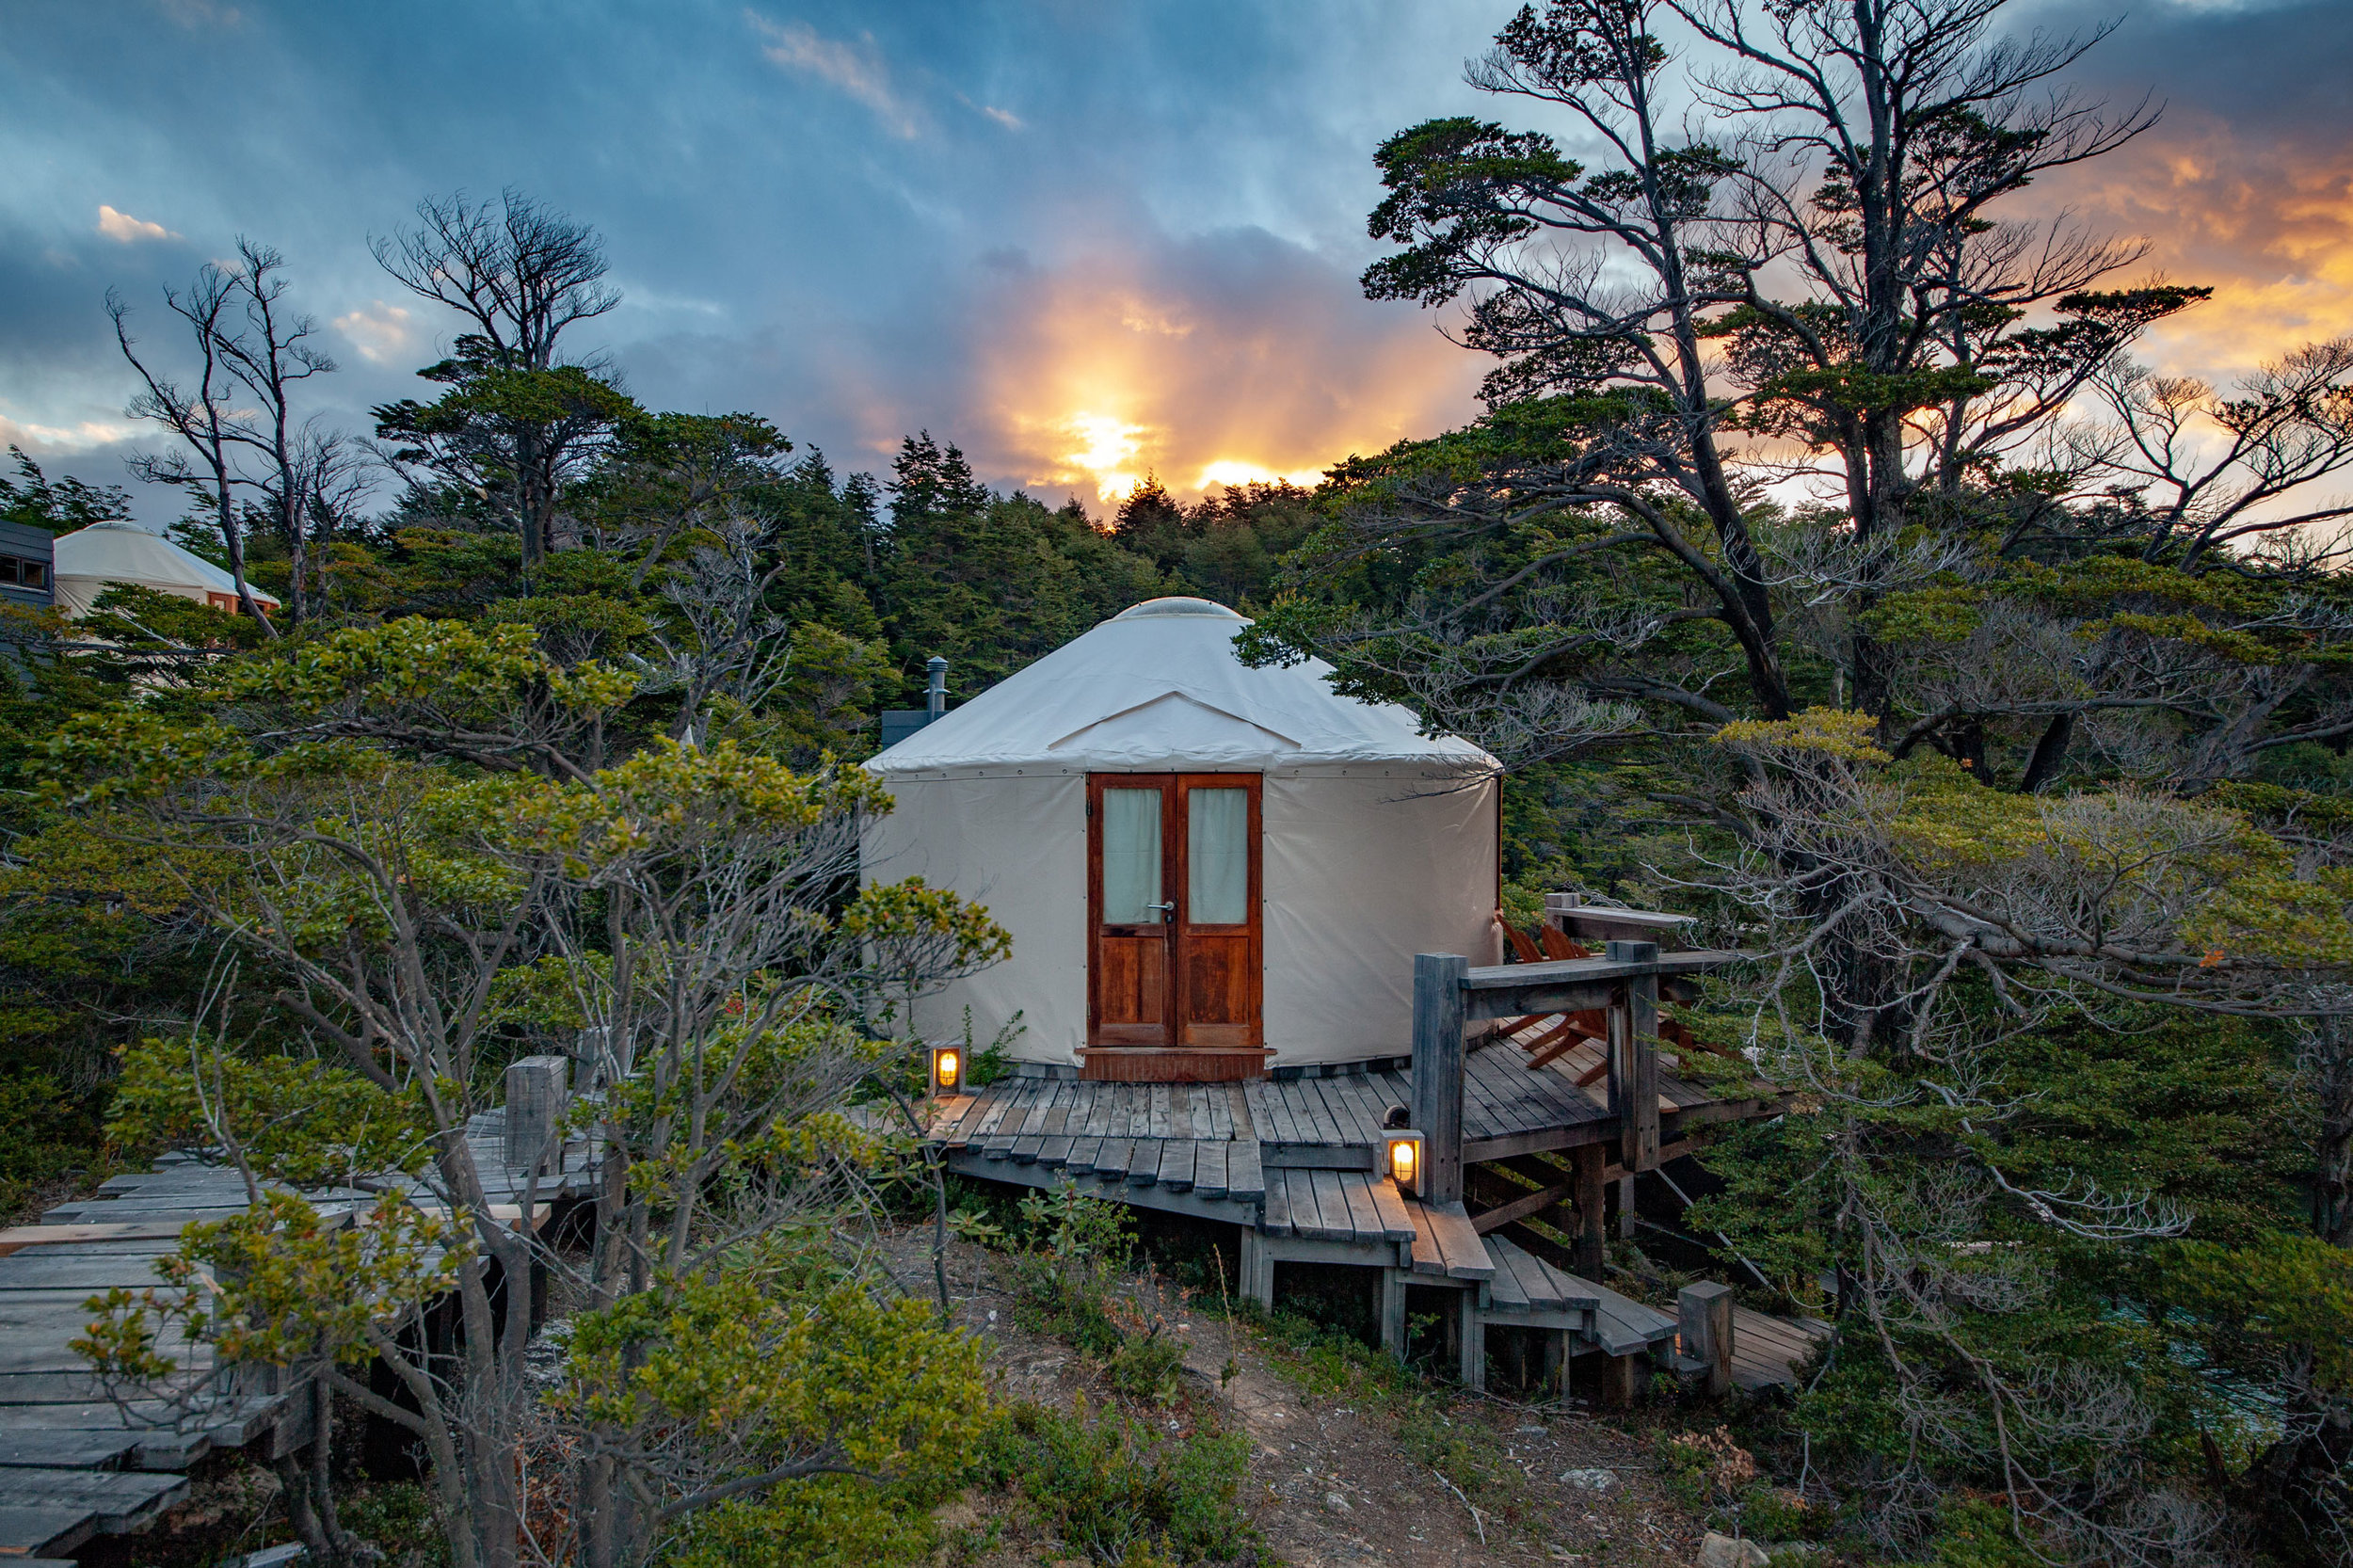 yurt-patagonia.jpg